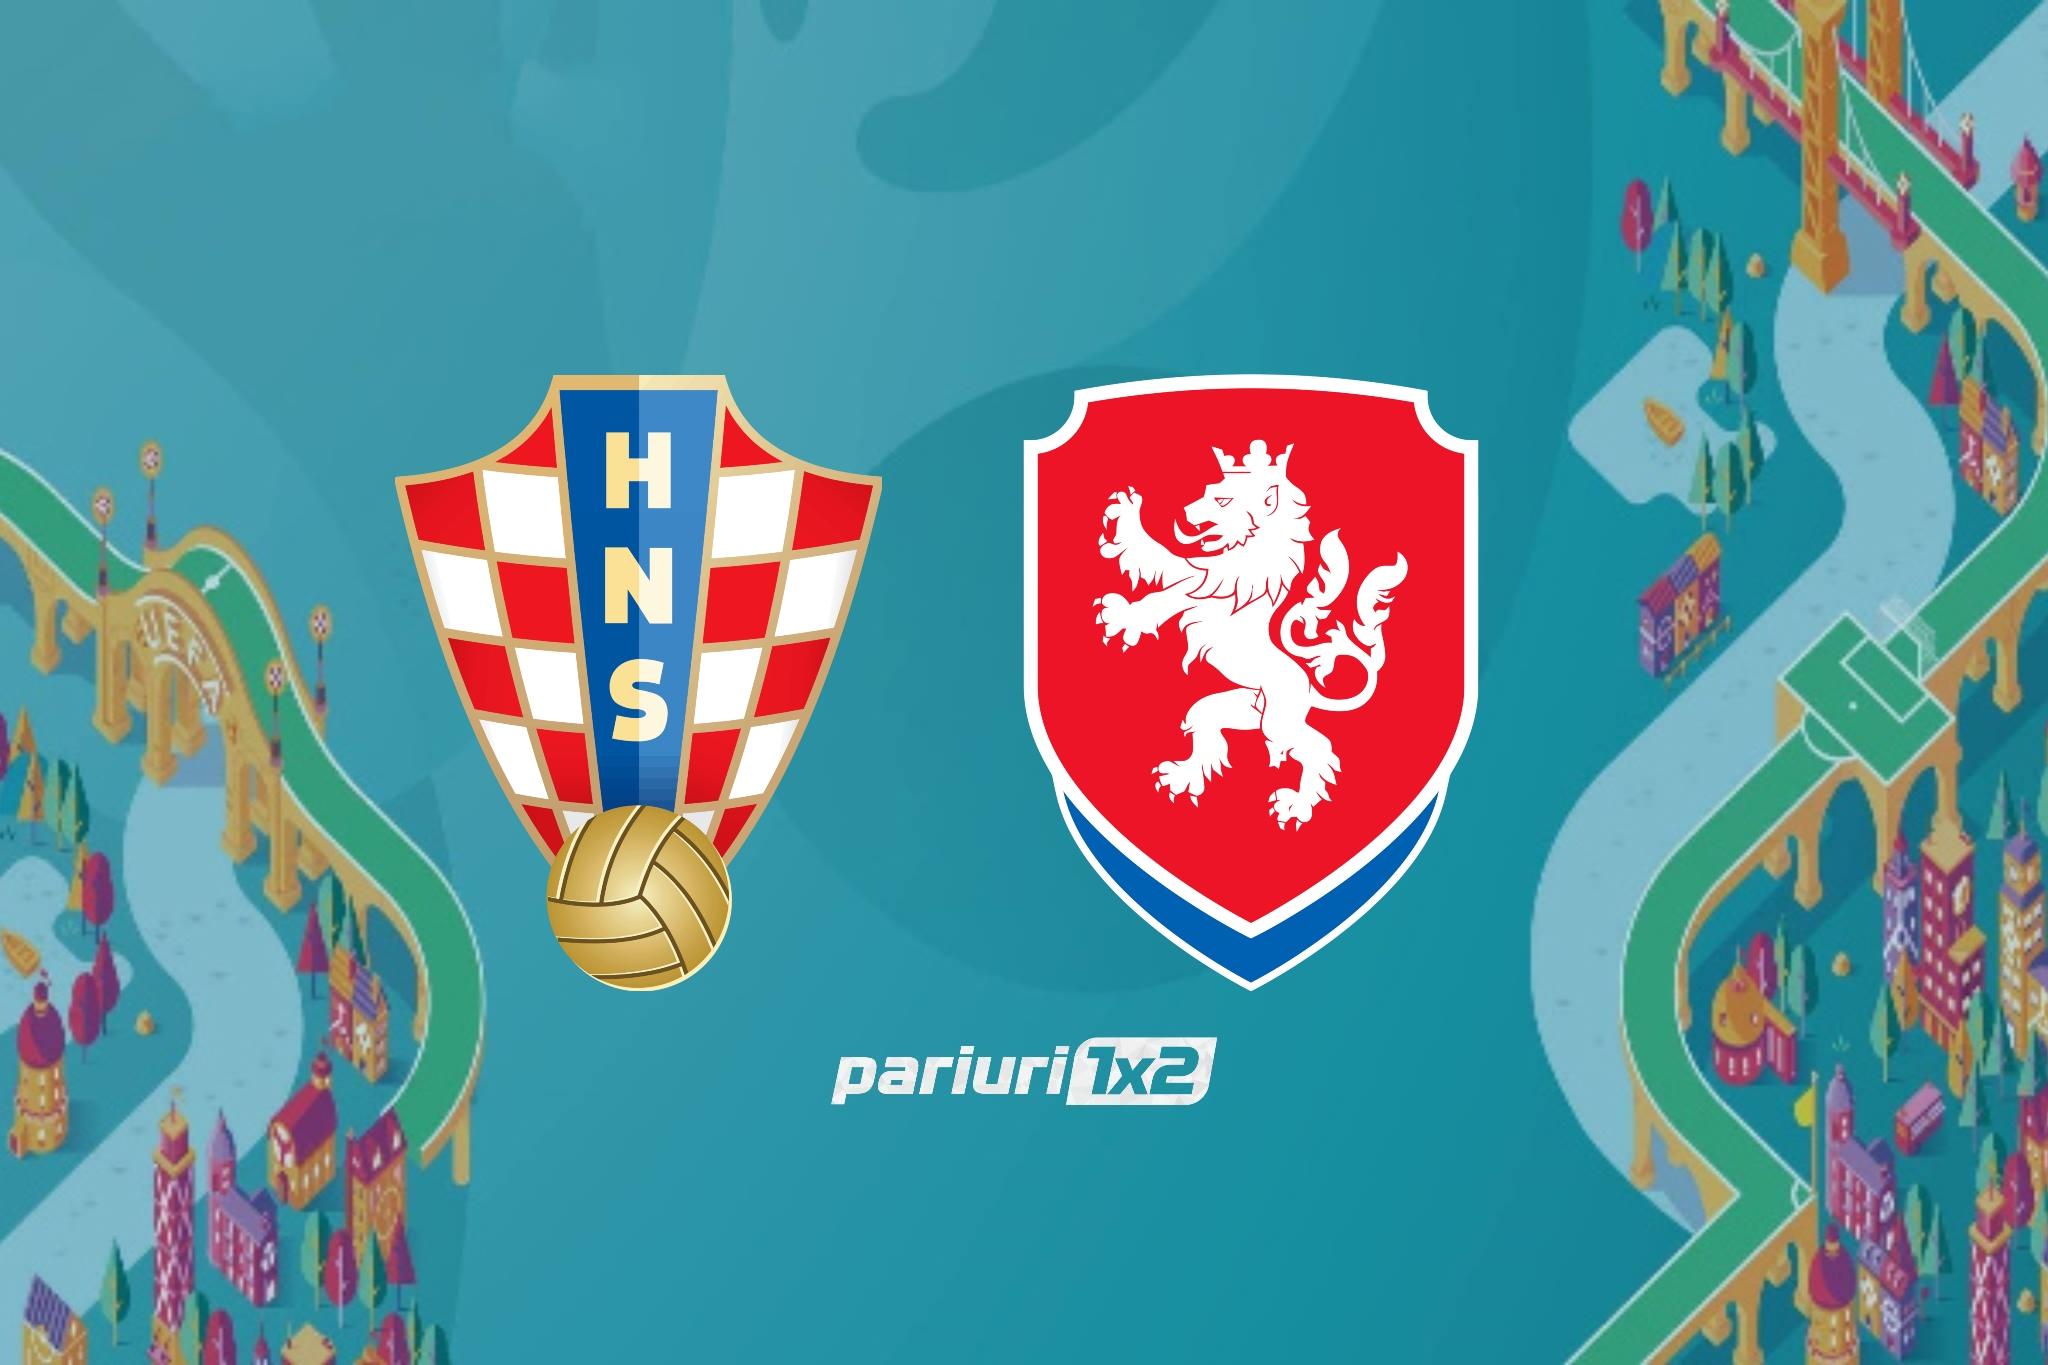 croatia-cehia